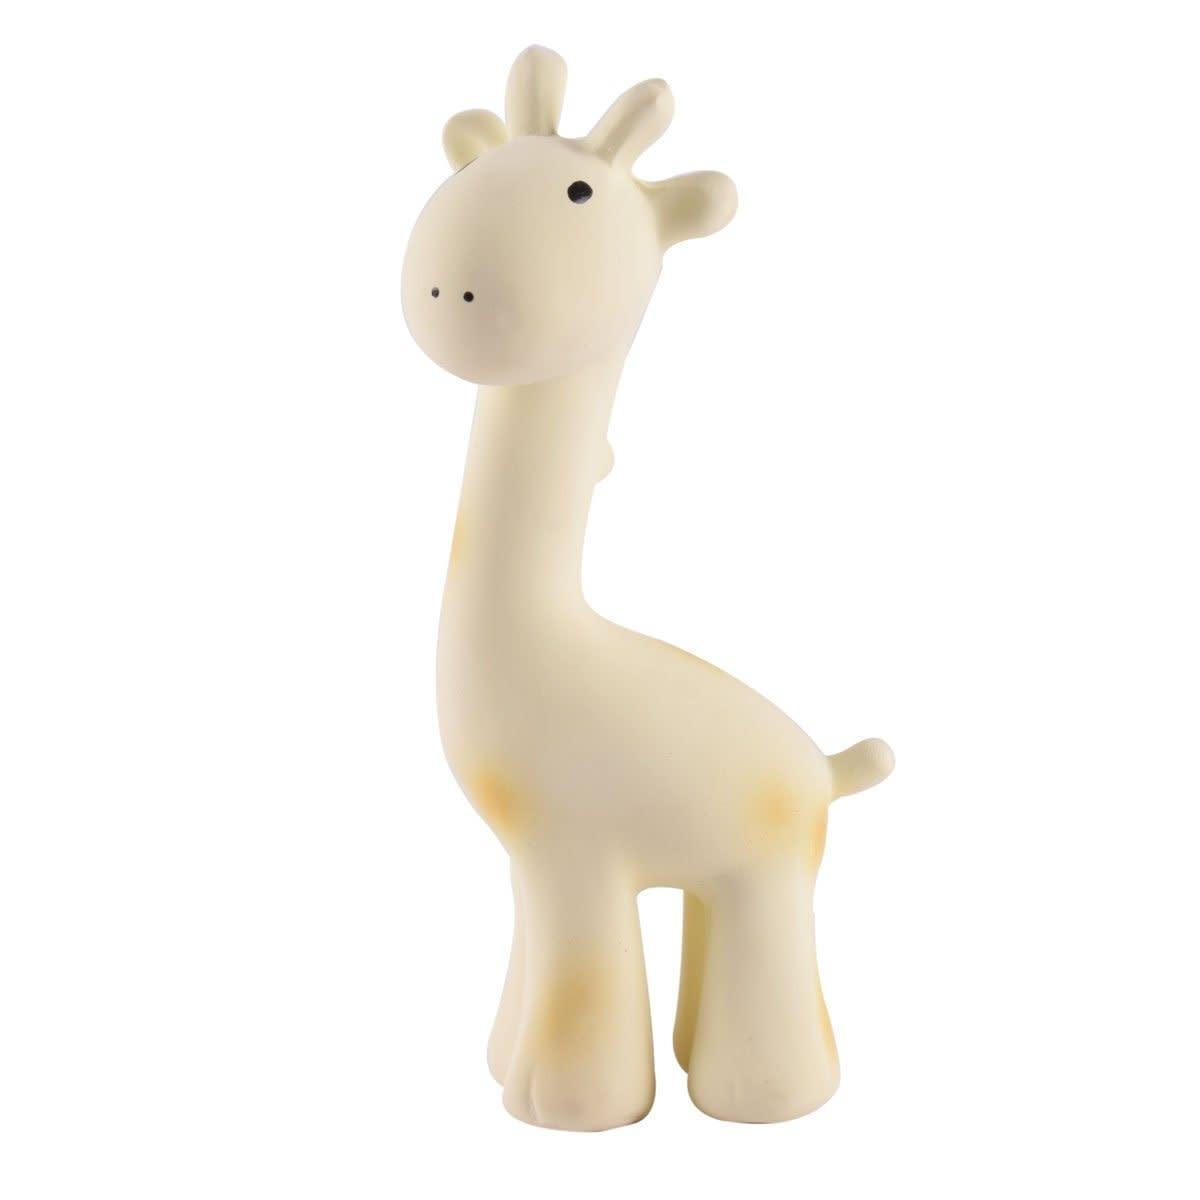 Tikiri Bijtspeeltje - Giraf-1